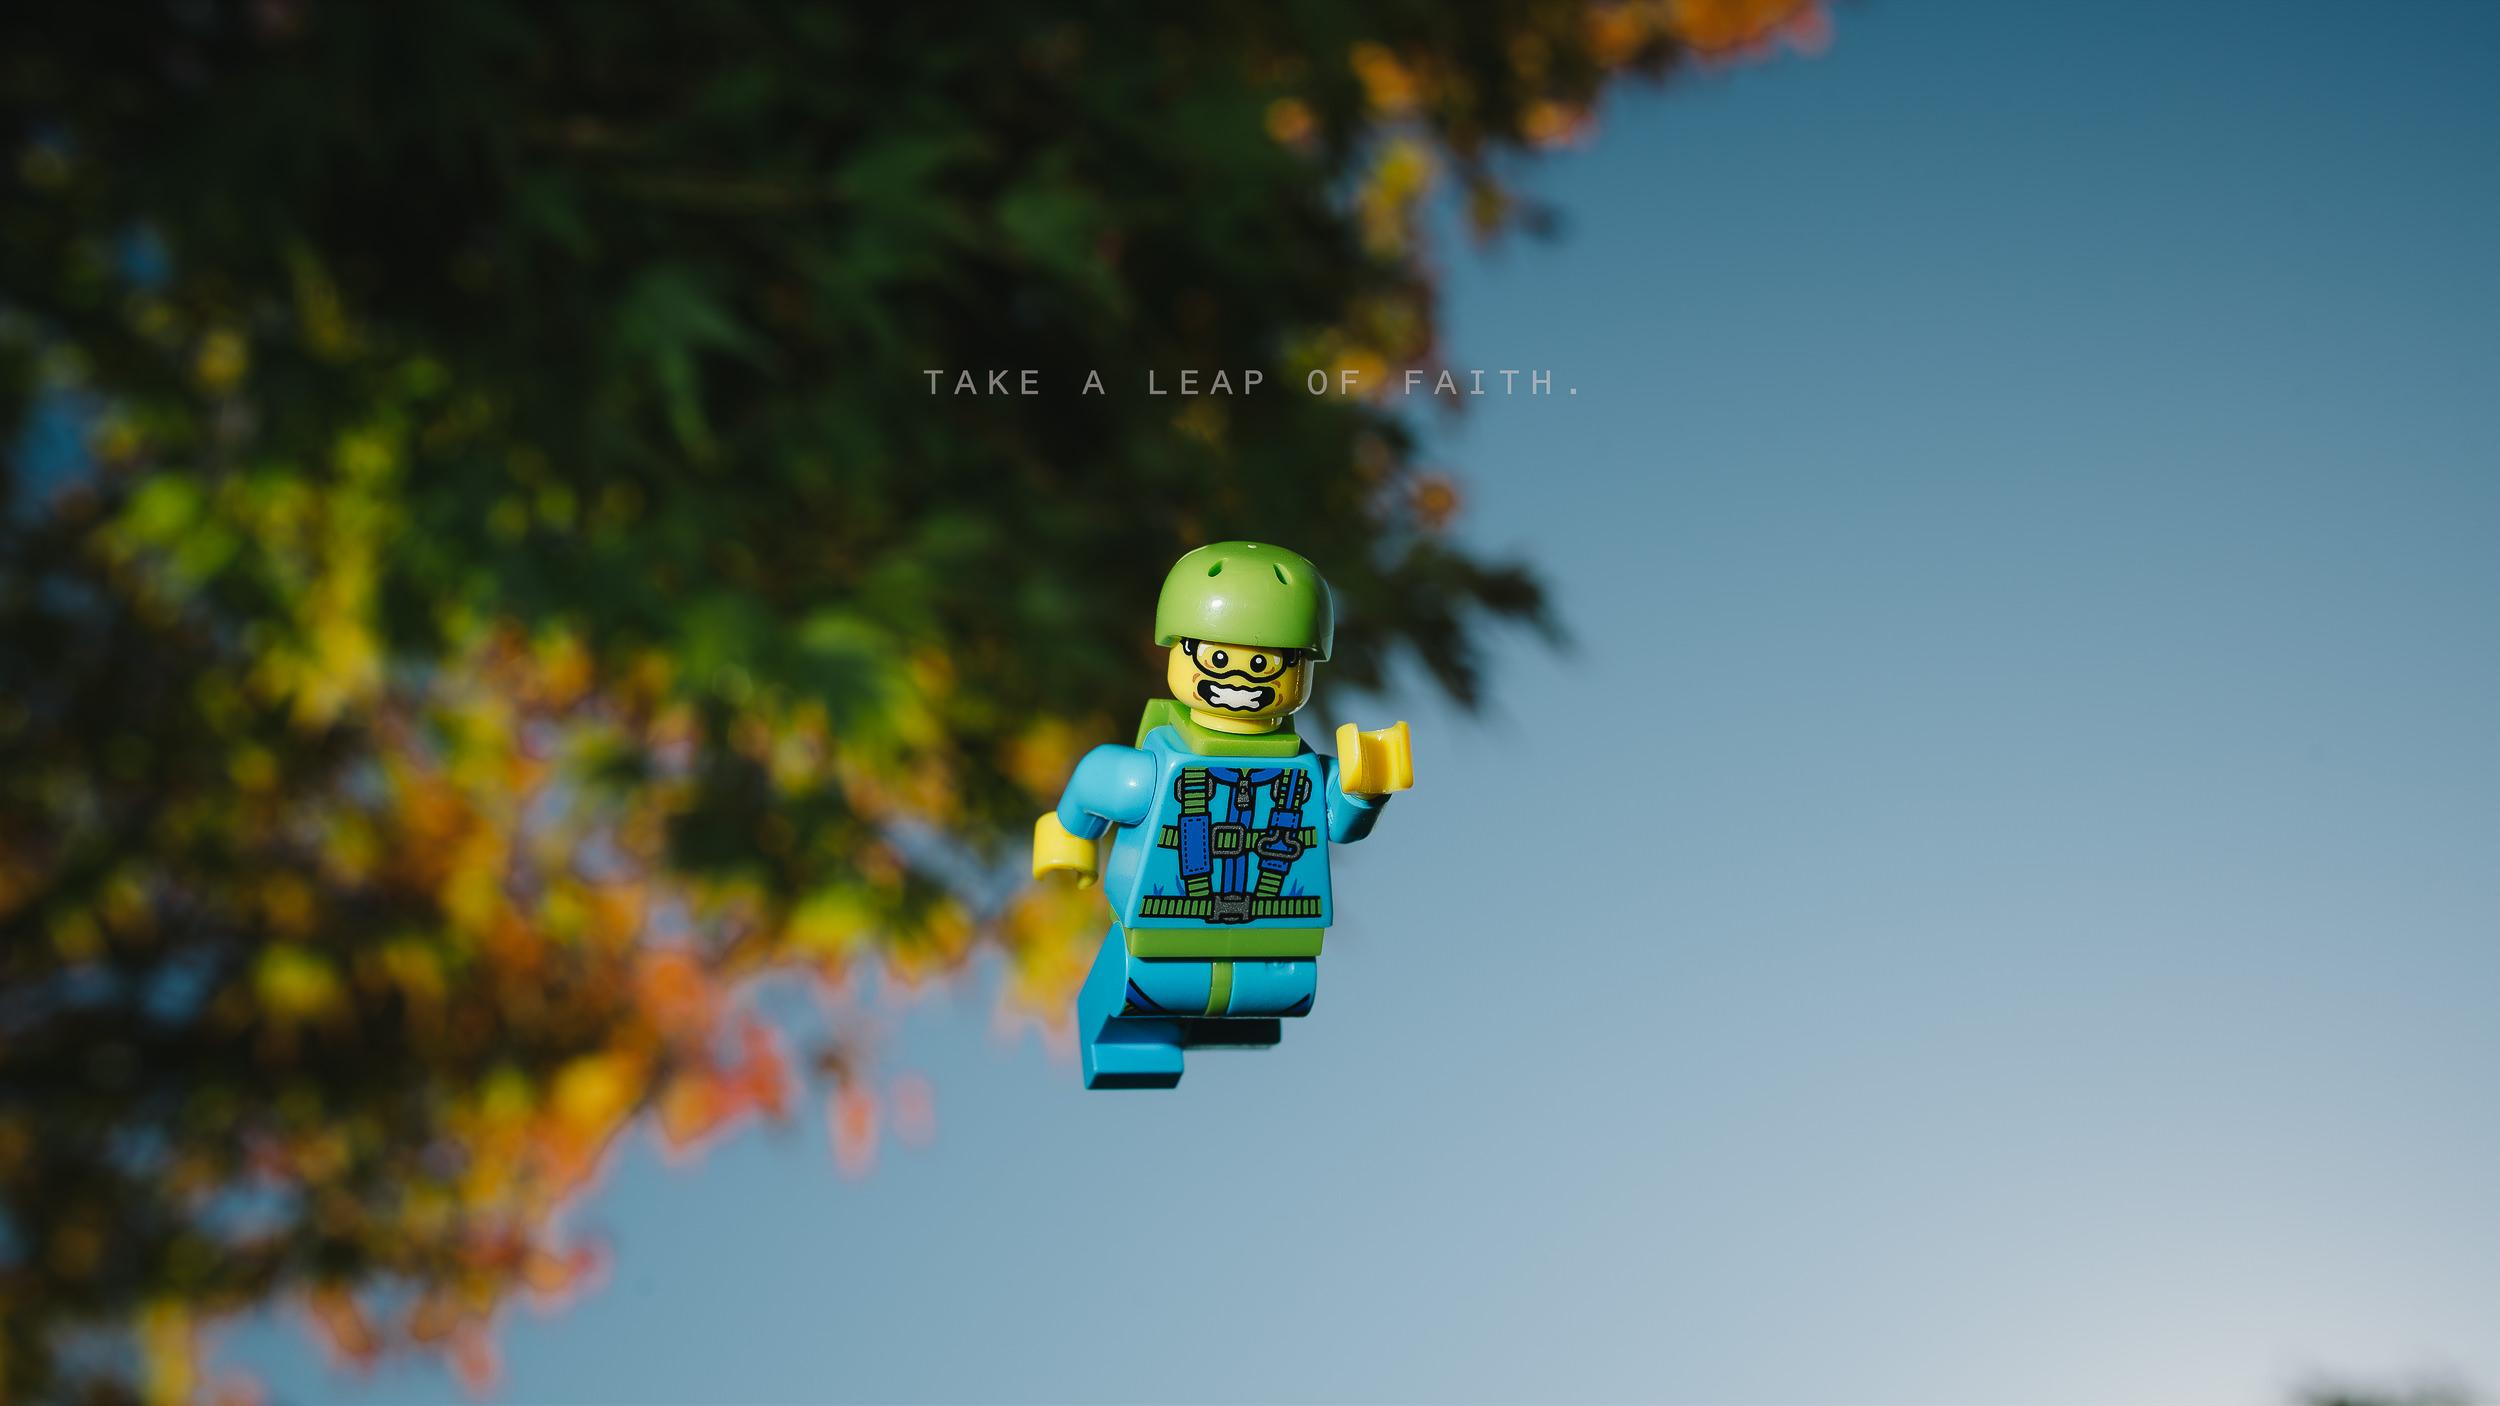 Lego-Portrait-Series-Reggie-Ballesteros-0020.jpg